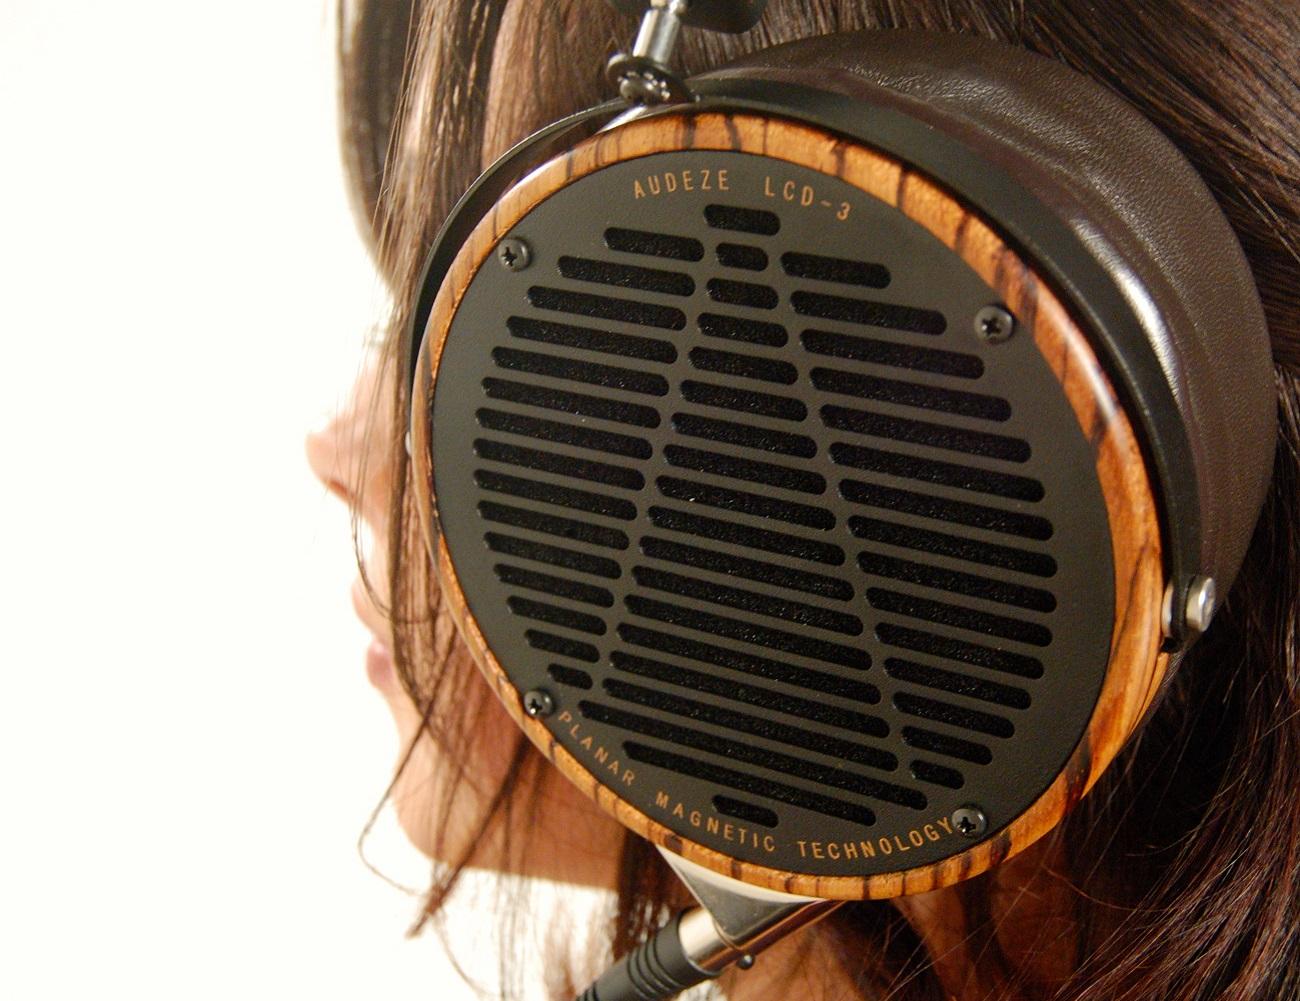 Audeze LCD-3 High-Performance Headphones